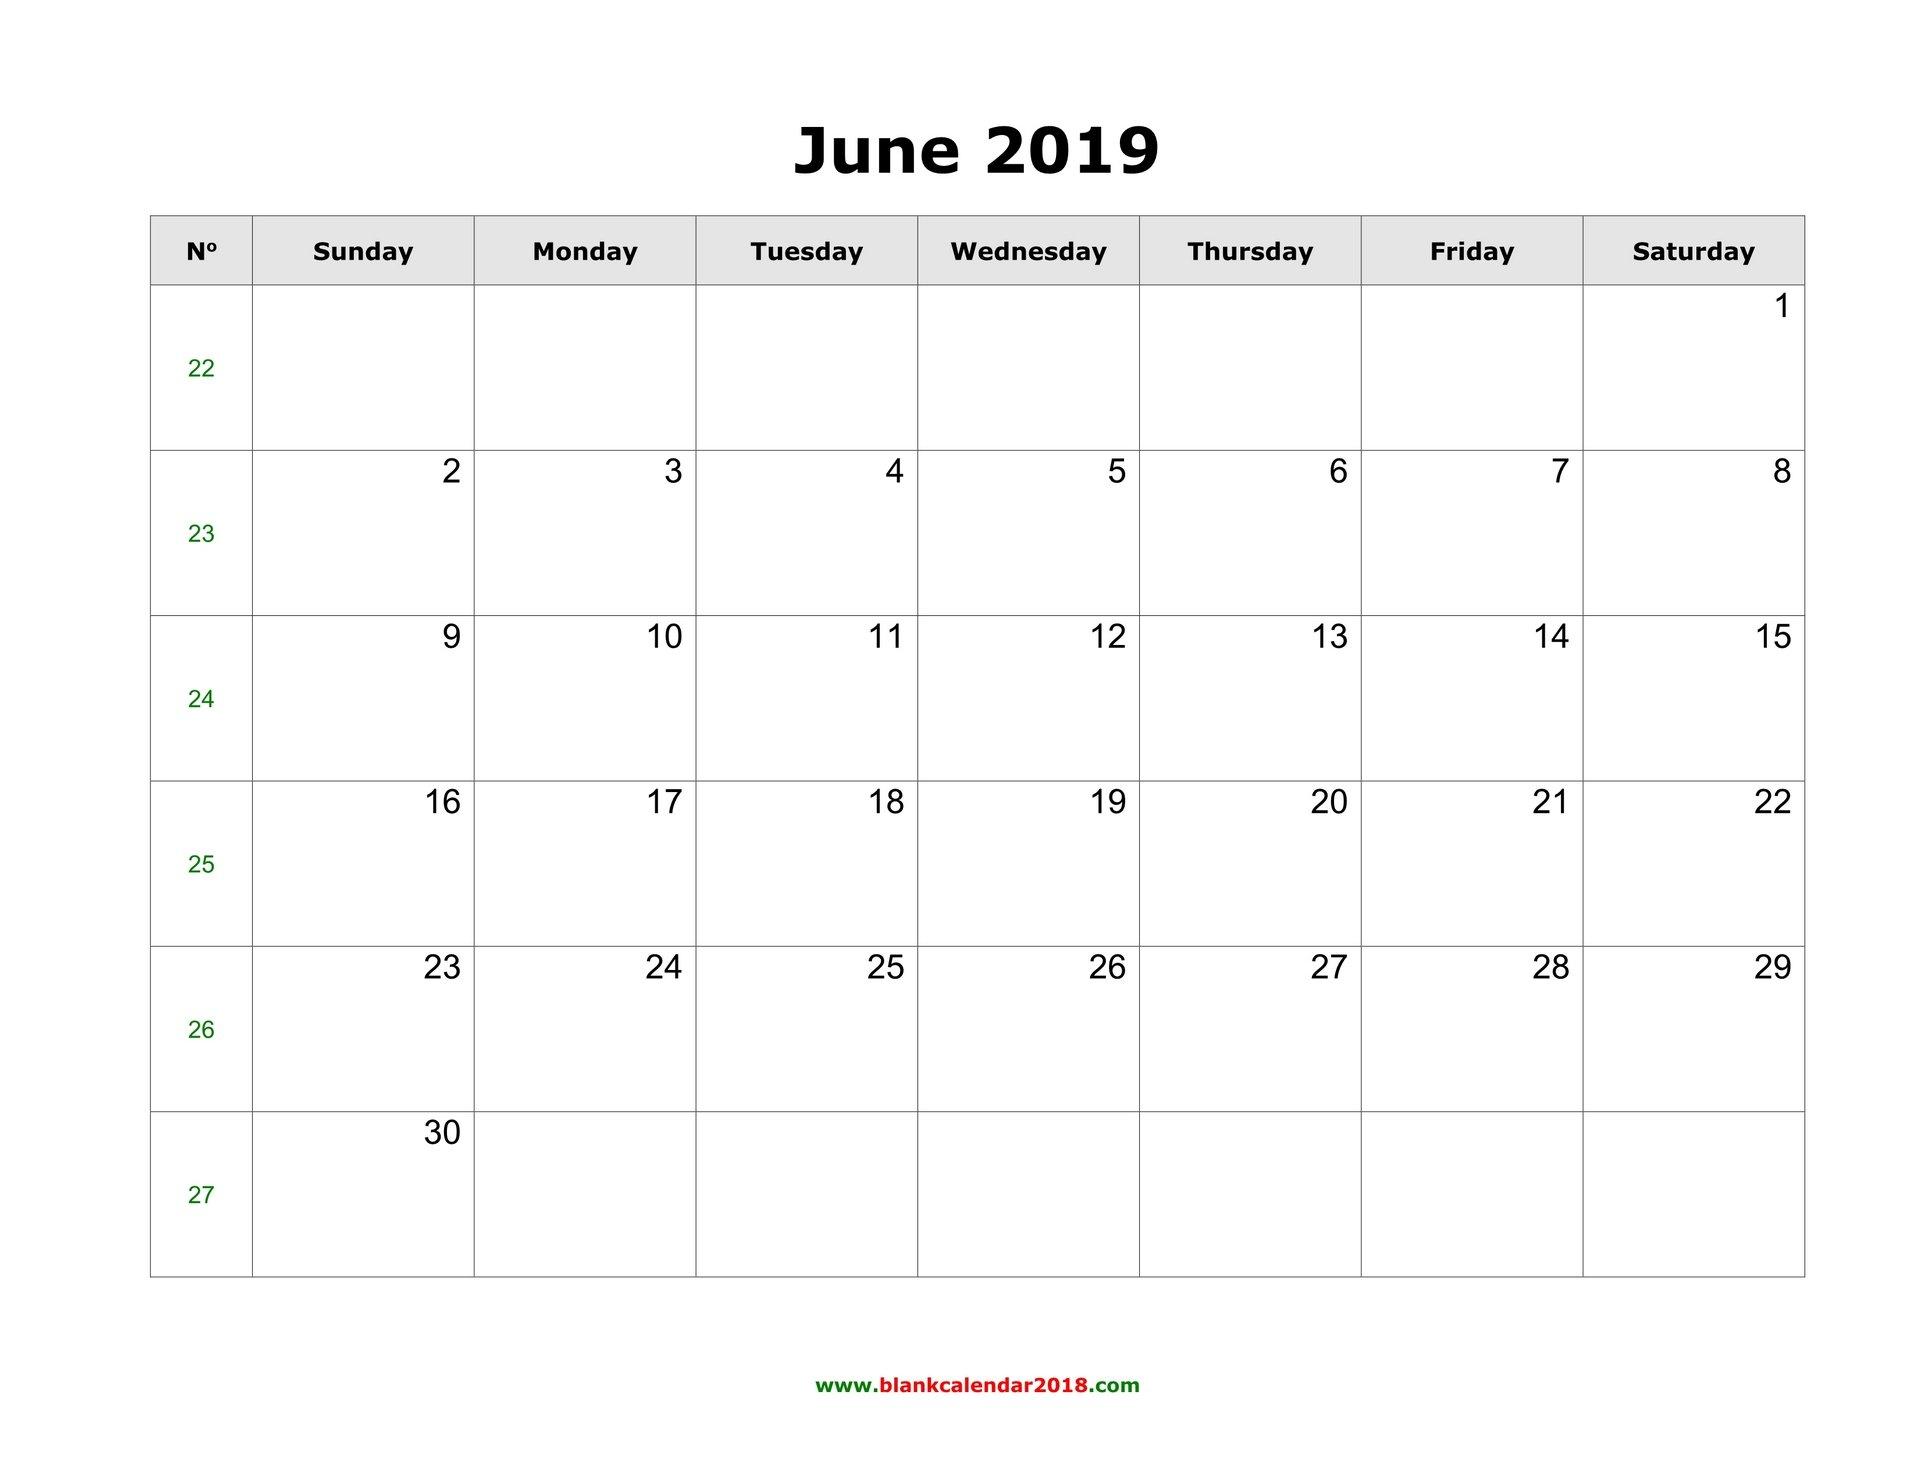 Blank Calendar For June 2019 Calendar 2019 In Word